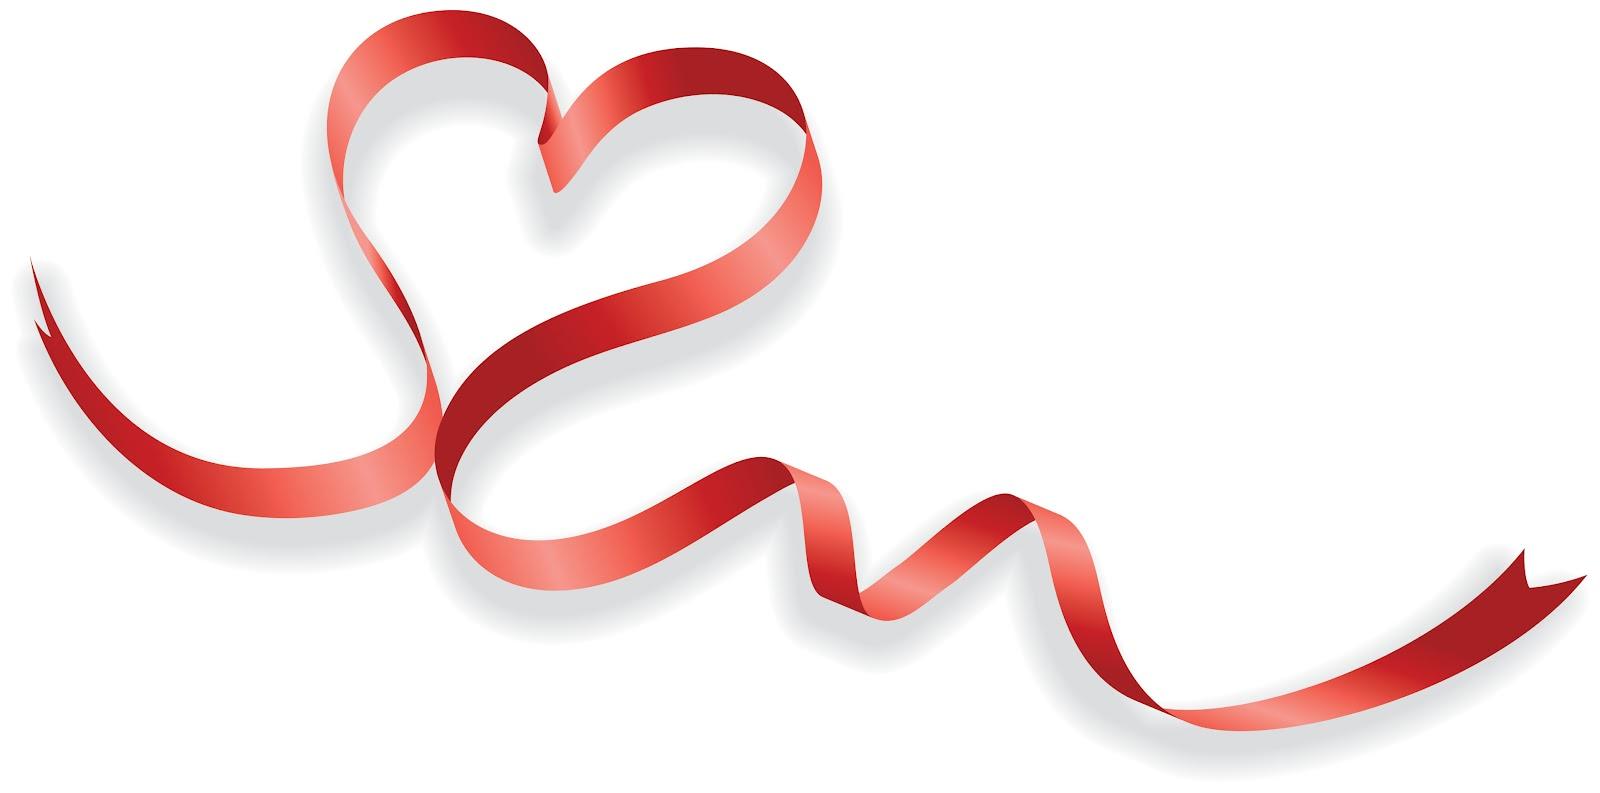 Unique-red-ribbon-heart-to-heart-wedding-invitations-ukf154-wedding